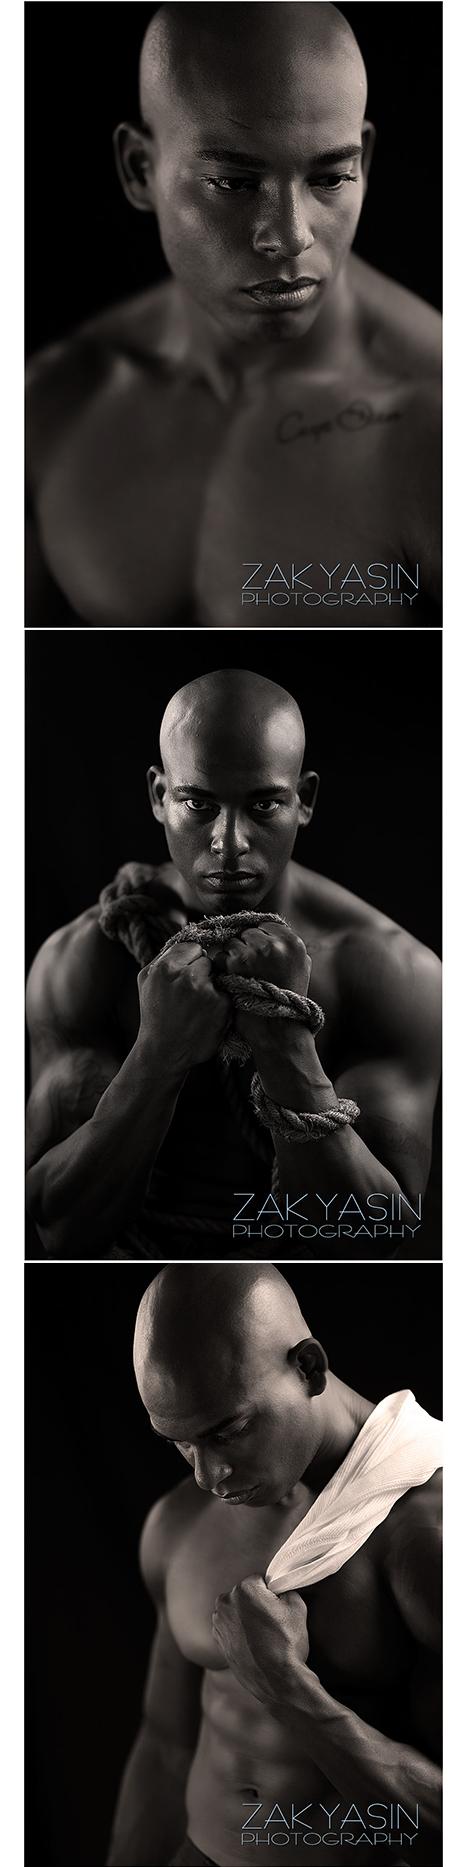 Male model photo shoot of ZAK YASIN in Chicago, Illinois